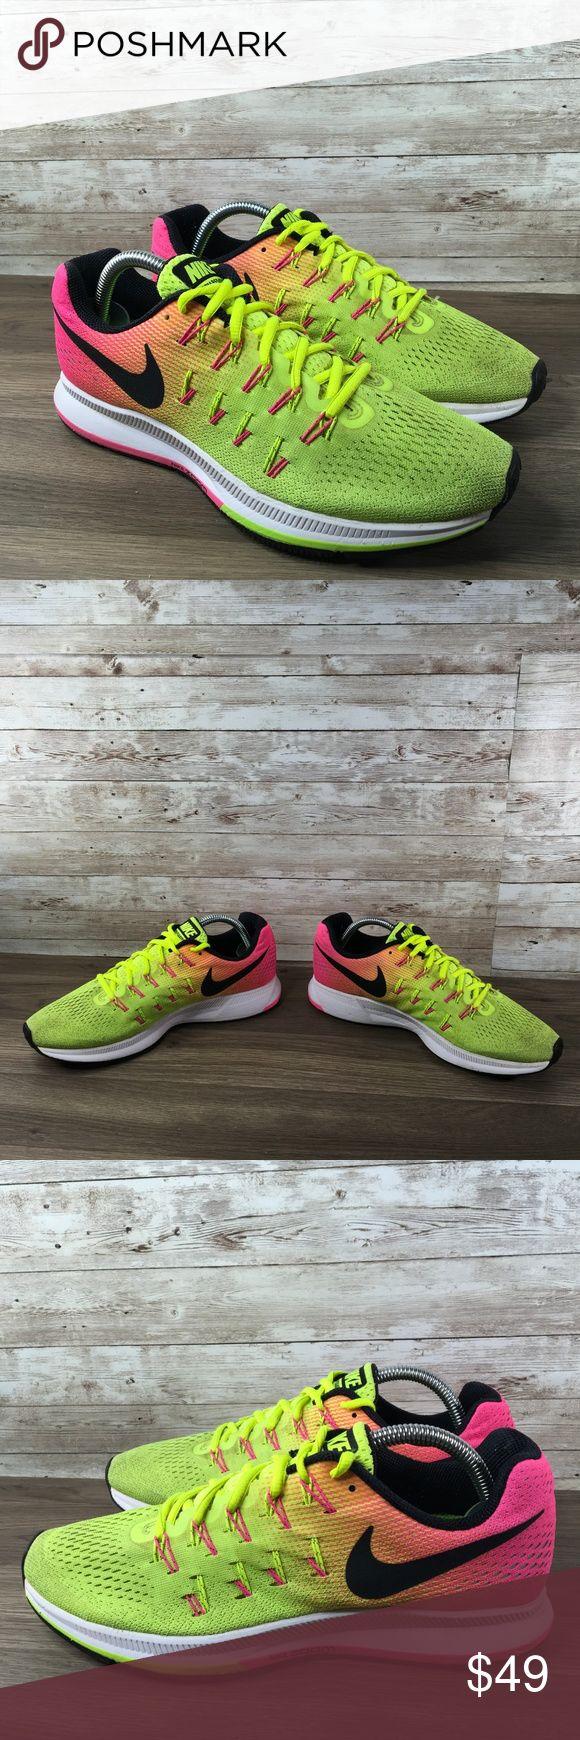 Nike Zoom Pegasus 33 Rio Olympic Limited Edition Gently used. Smoke free. No box…